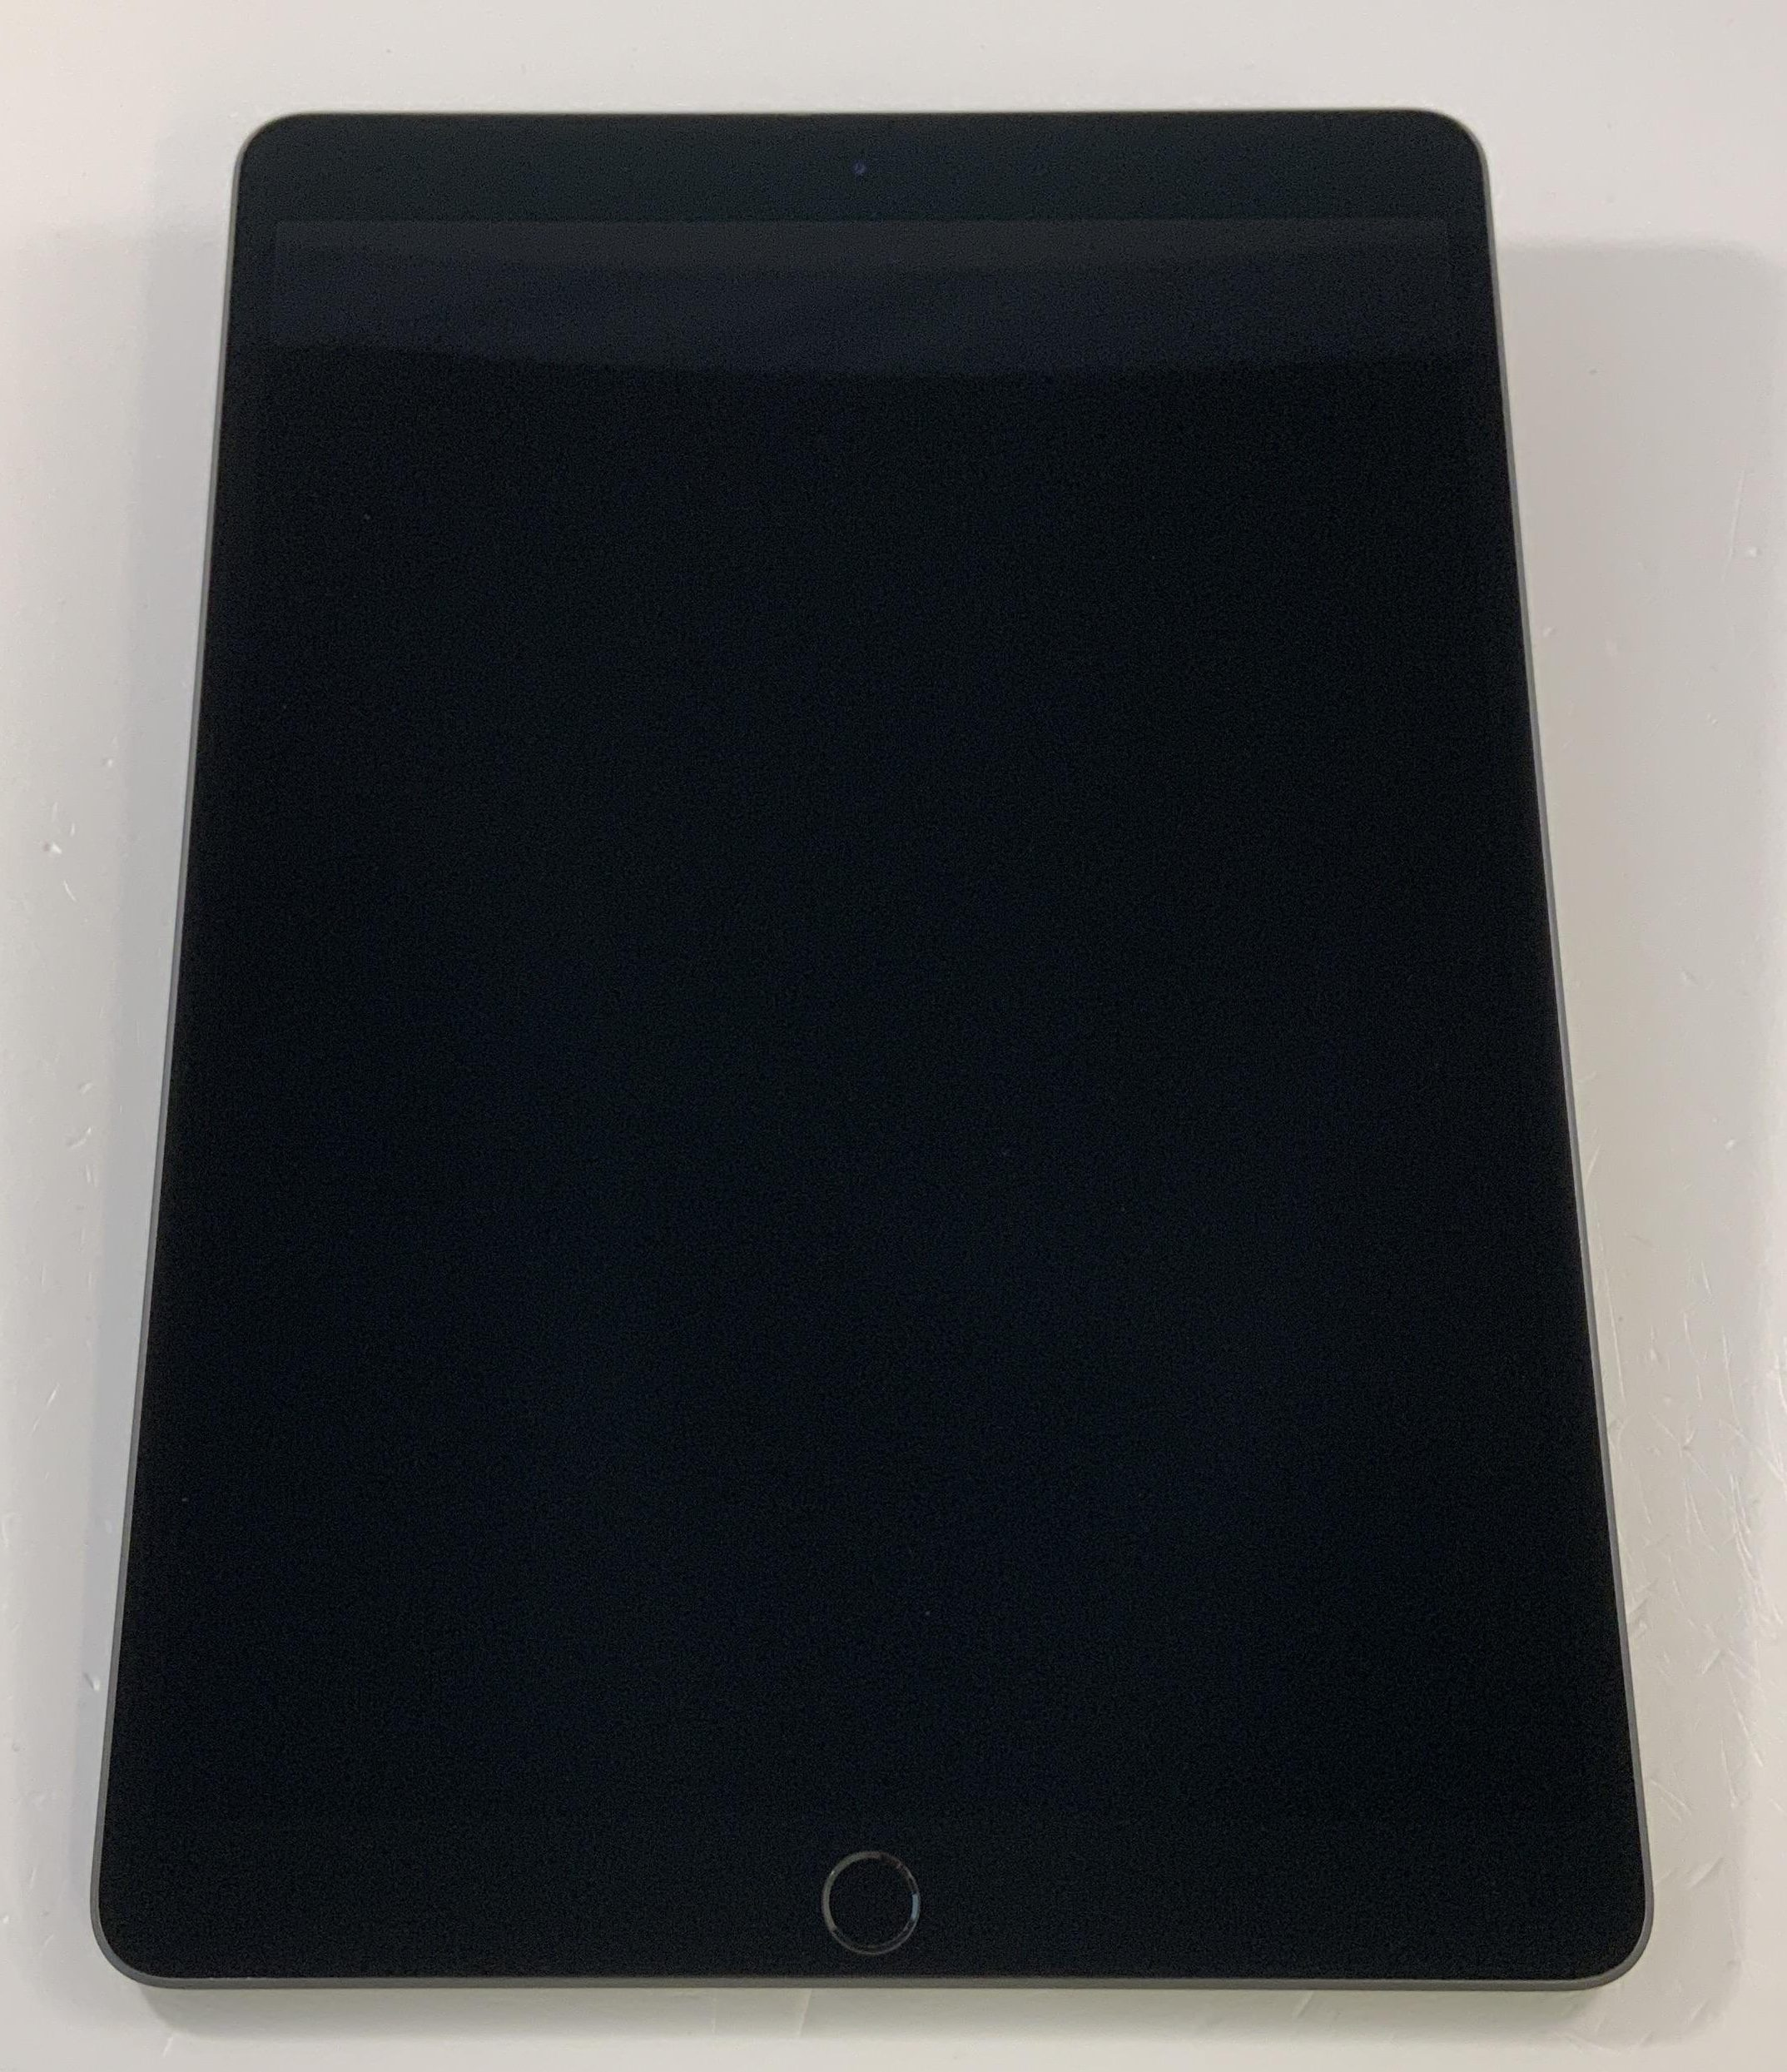 iPad Air 3 Wi-Fi 64GB, 64GB, Space Gray, immagine 1